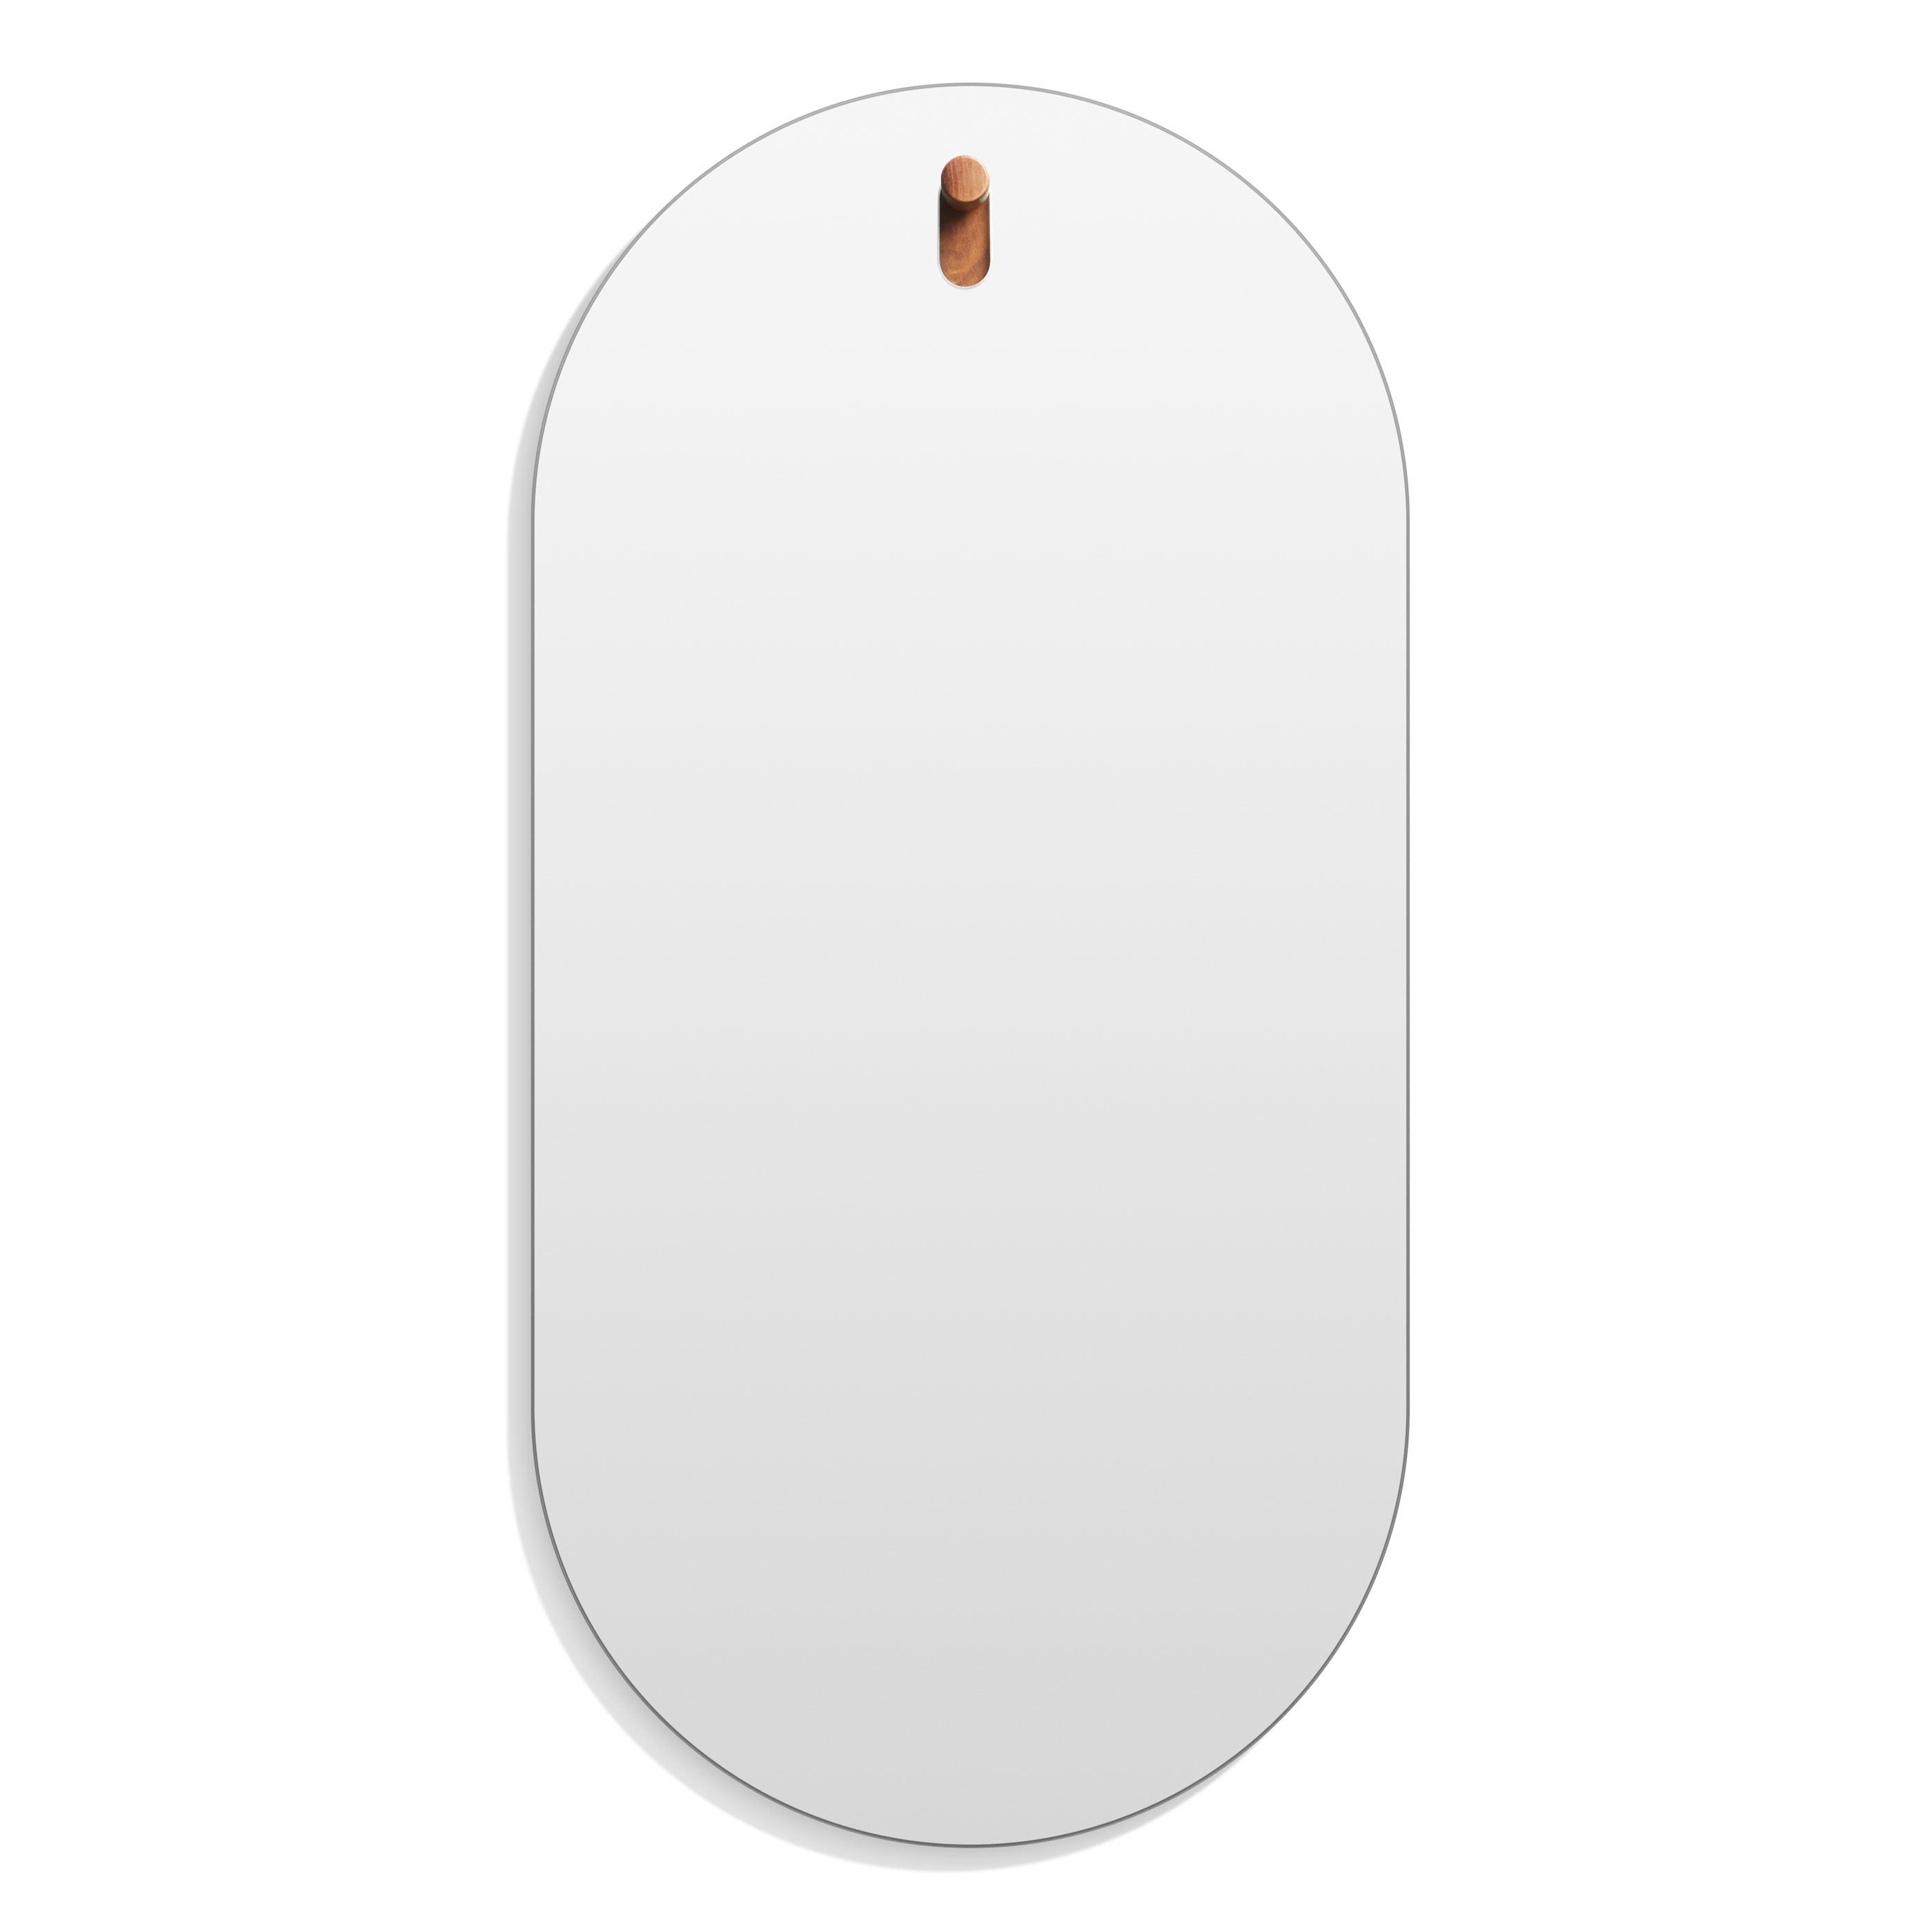 Hang 1 Capsule Mirror